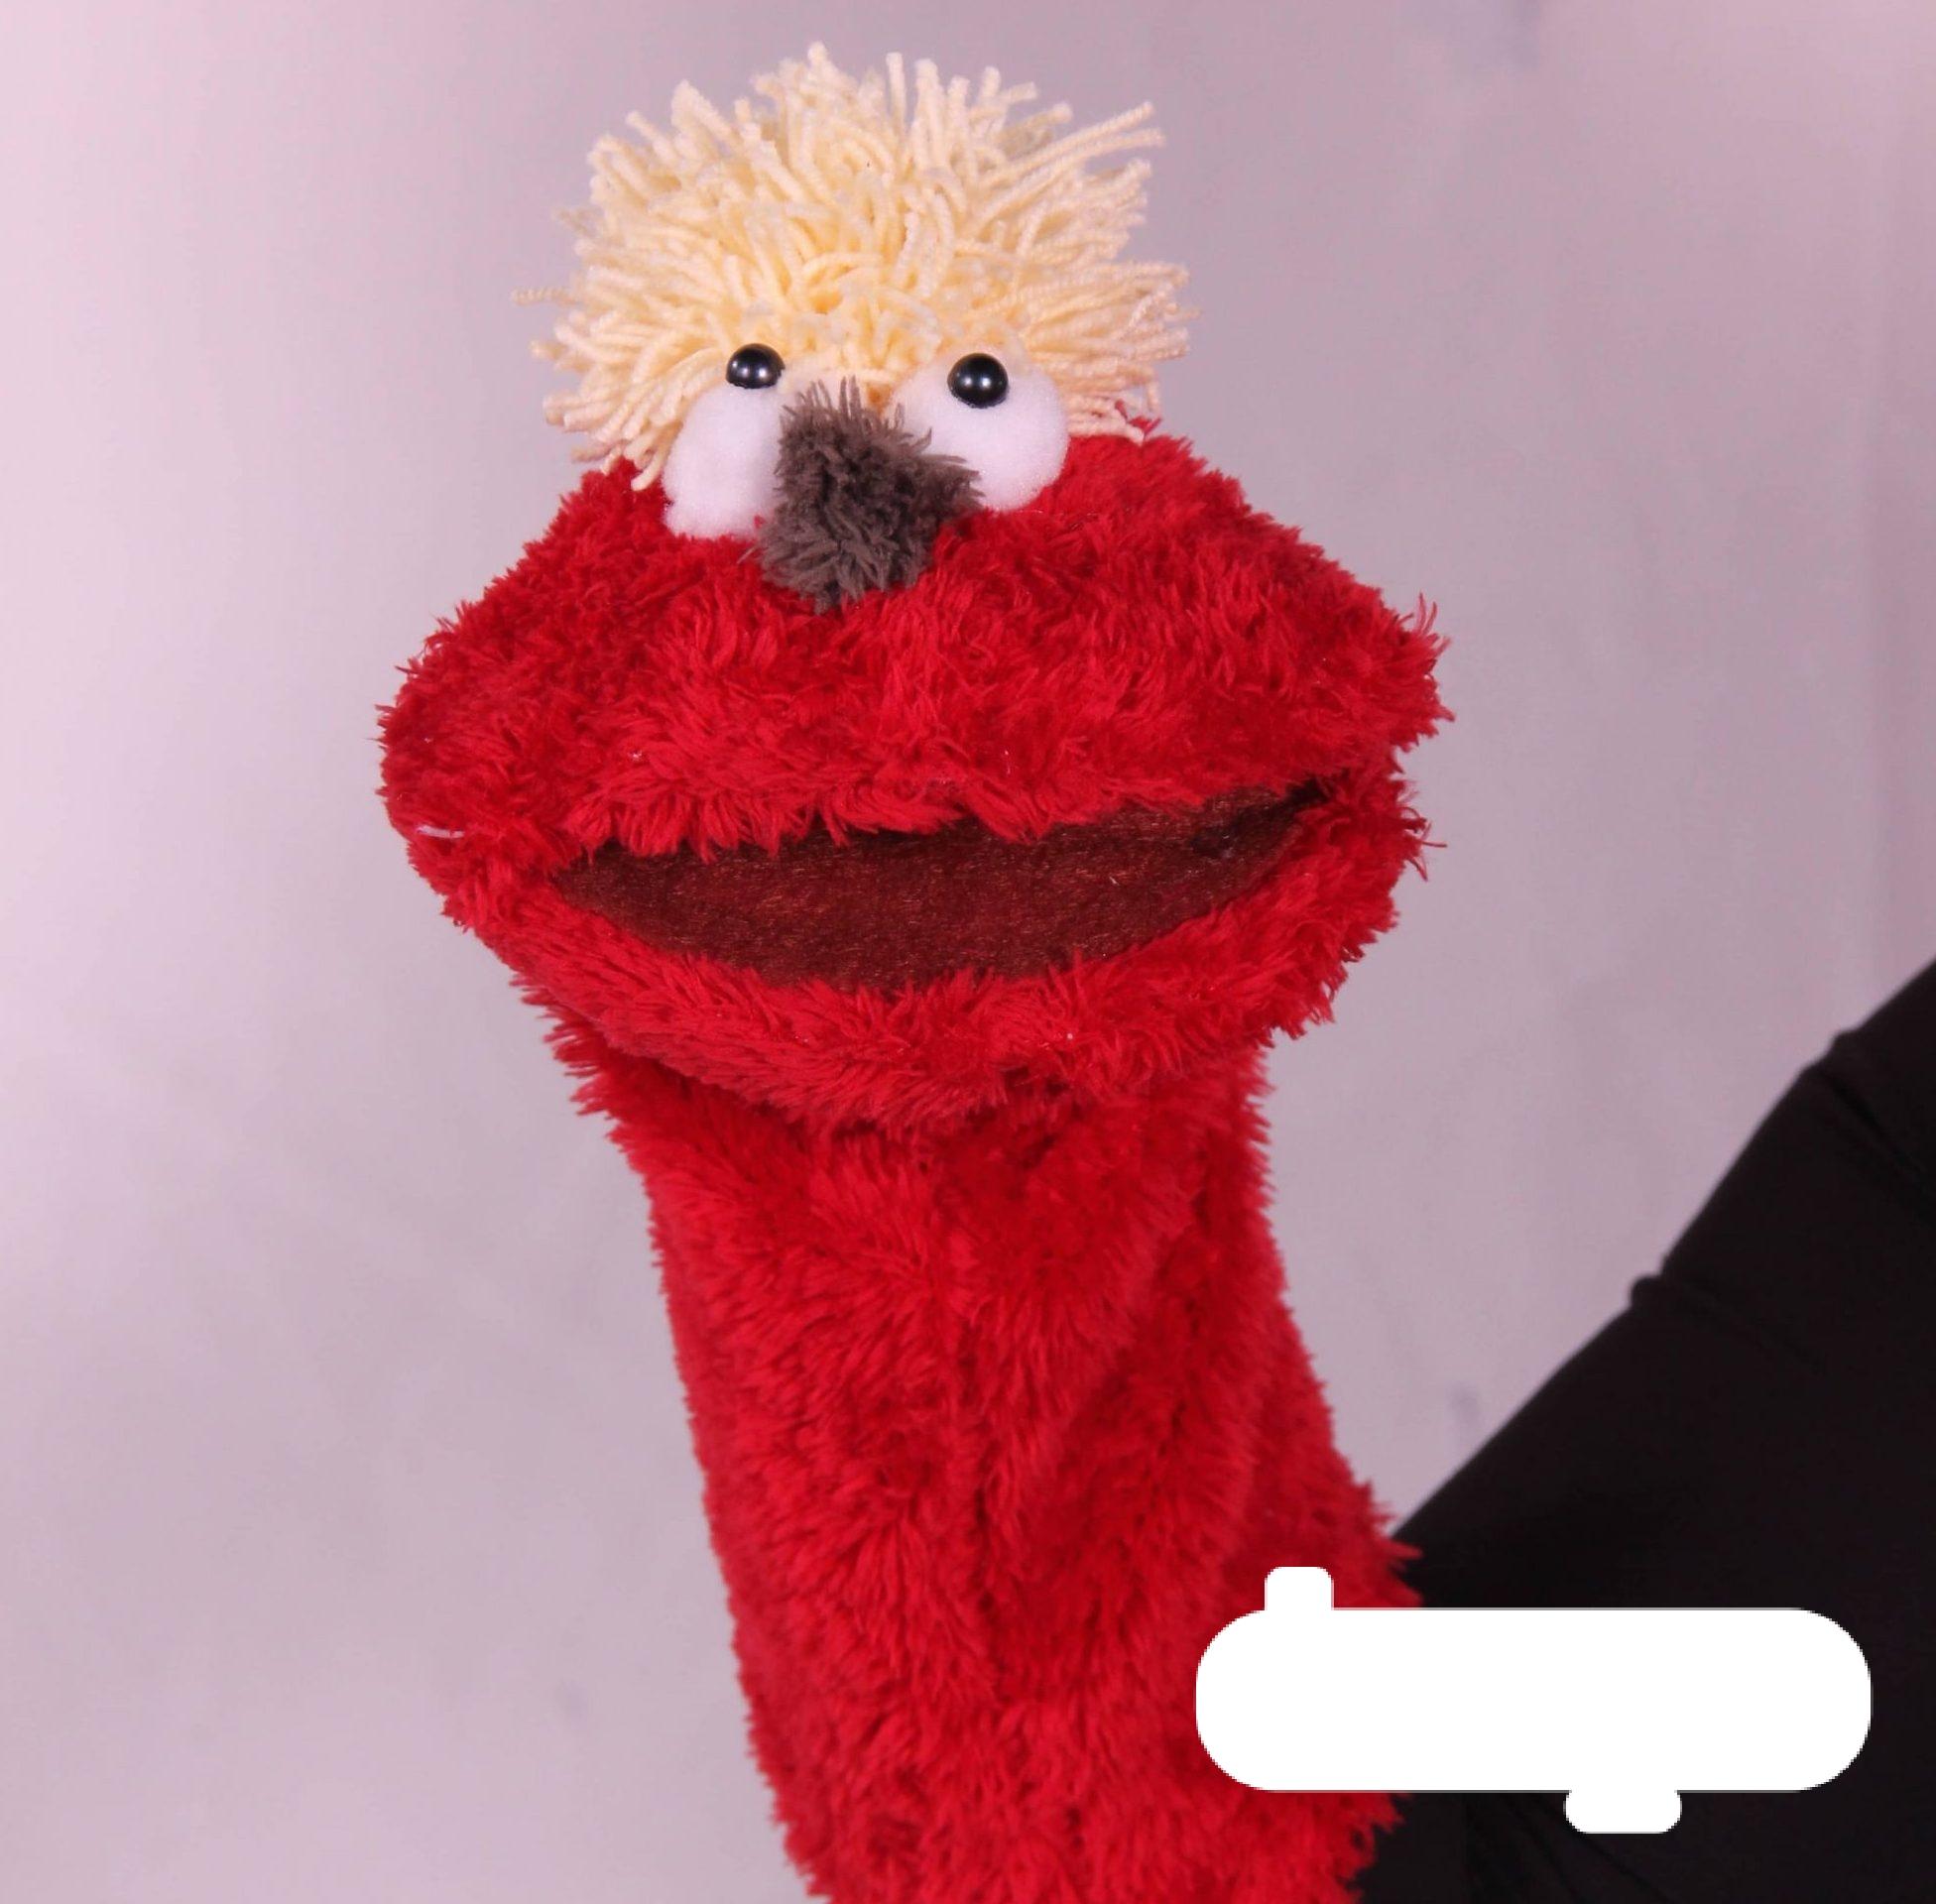 عروسک دستکشی خنگول قرمز